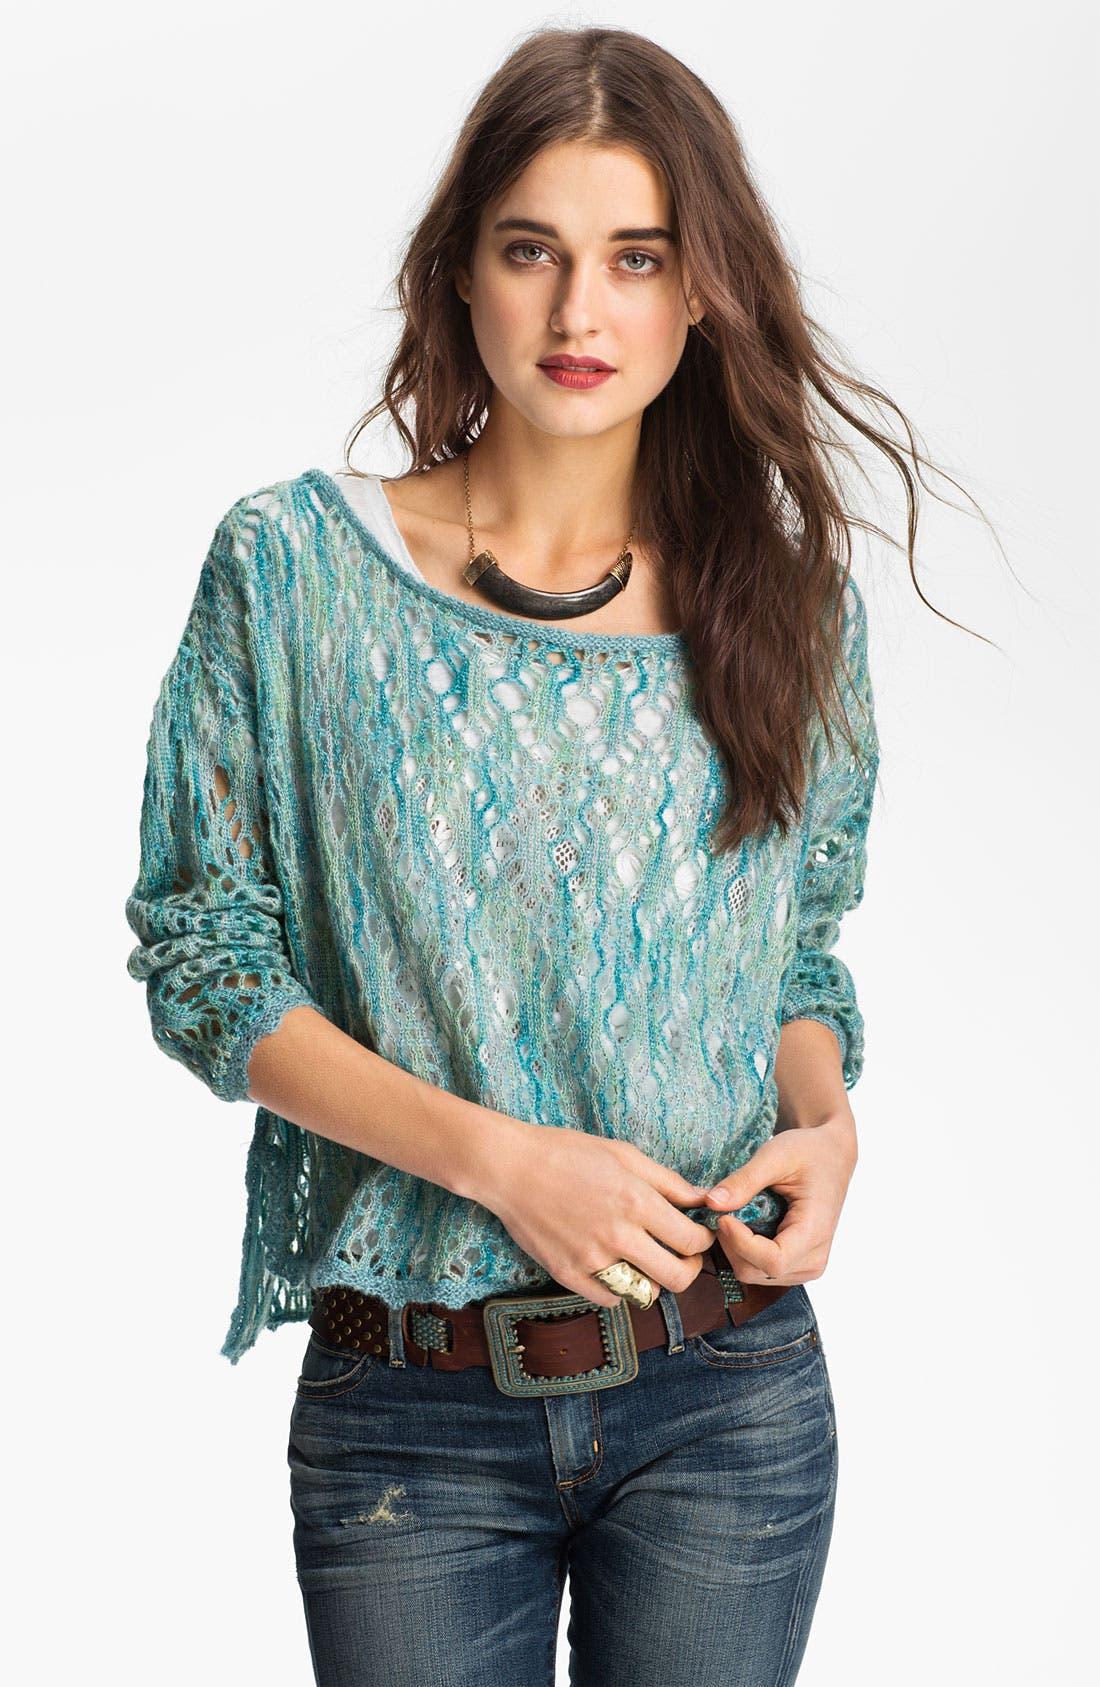 Alternate Image 1 Selected - Free People Crochet Top